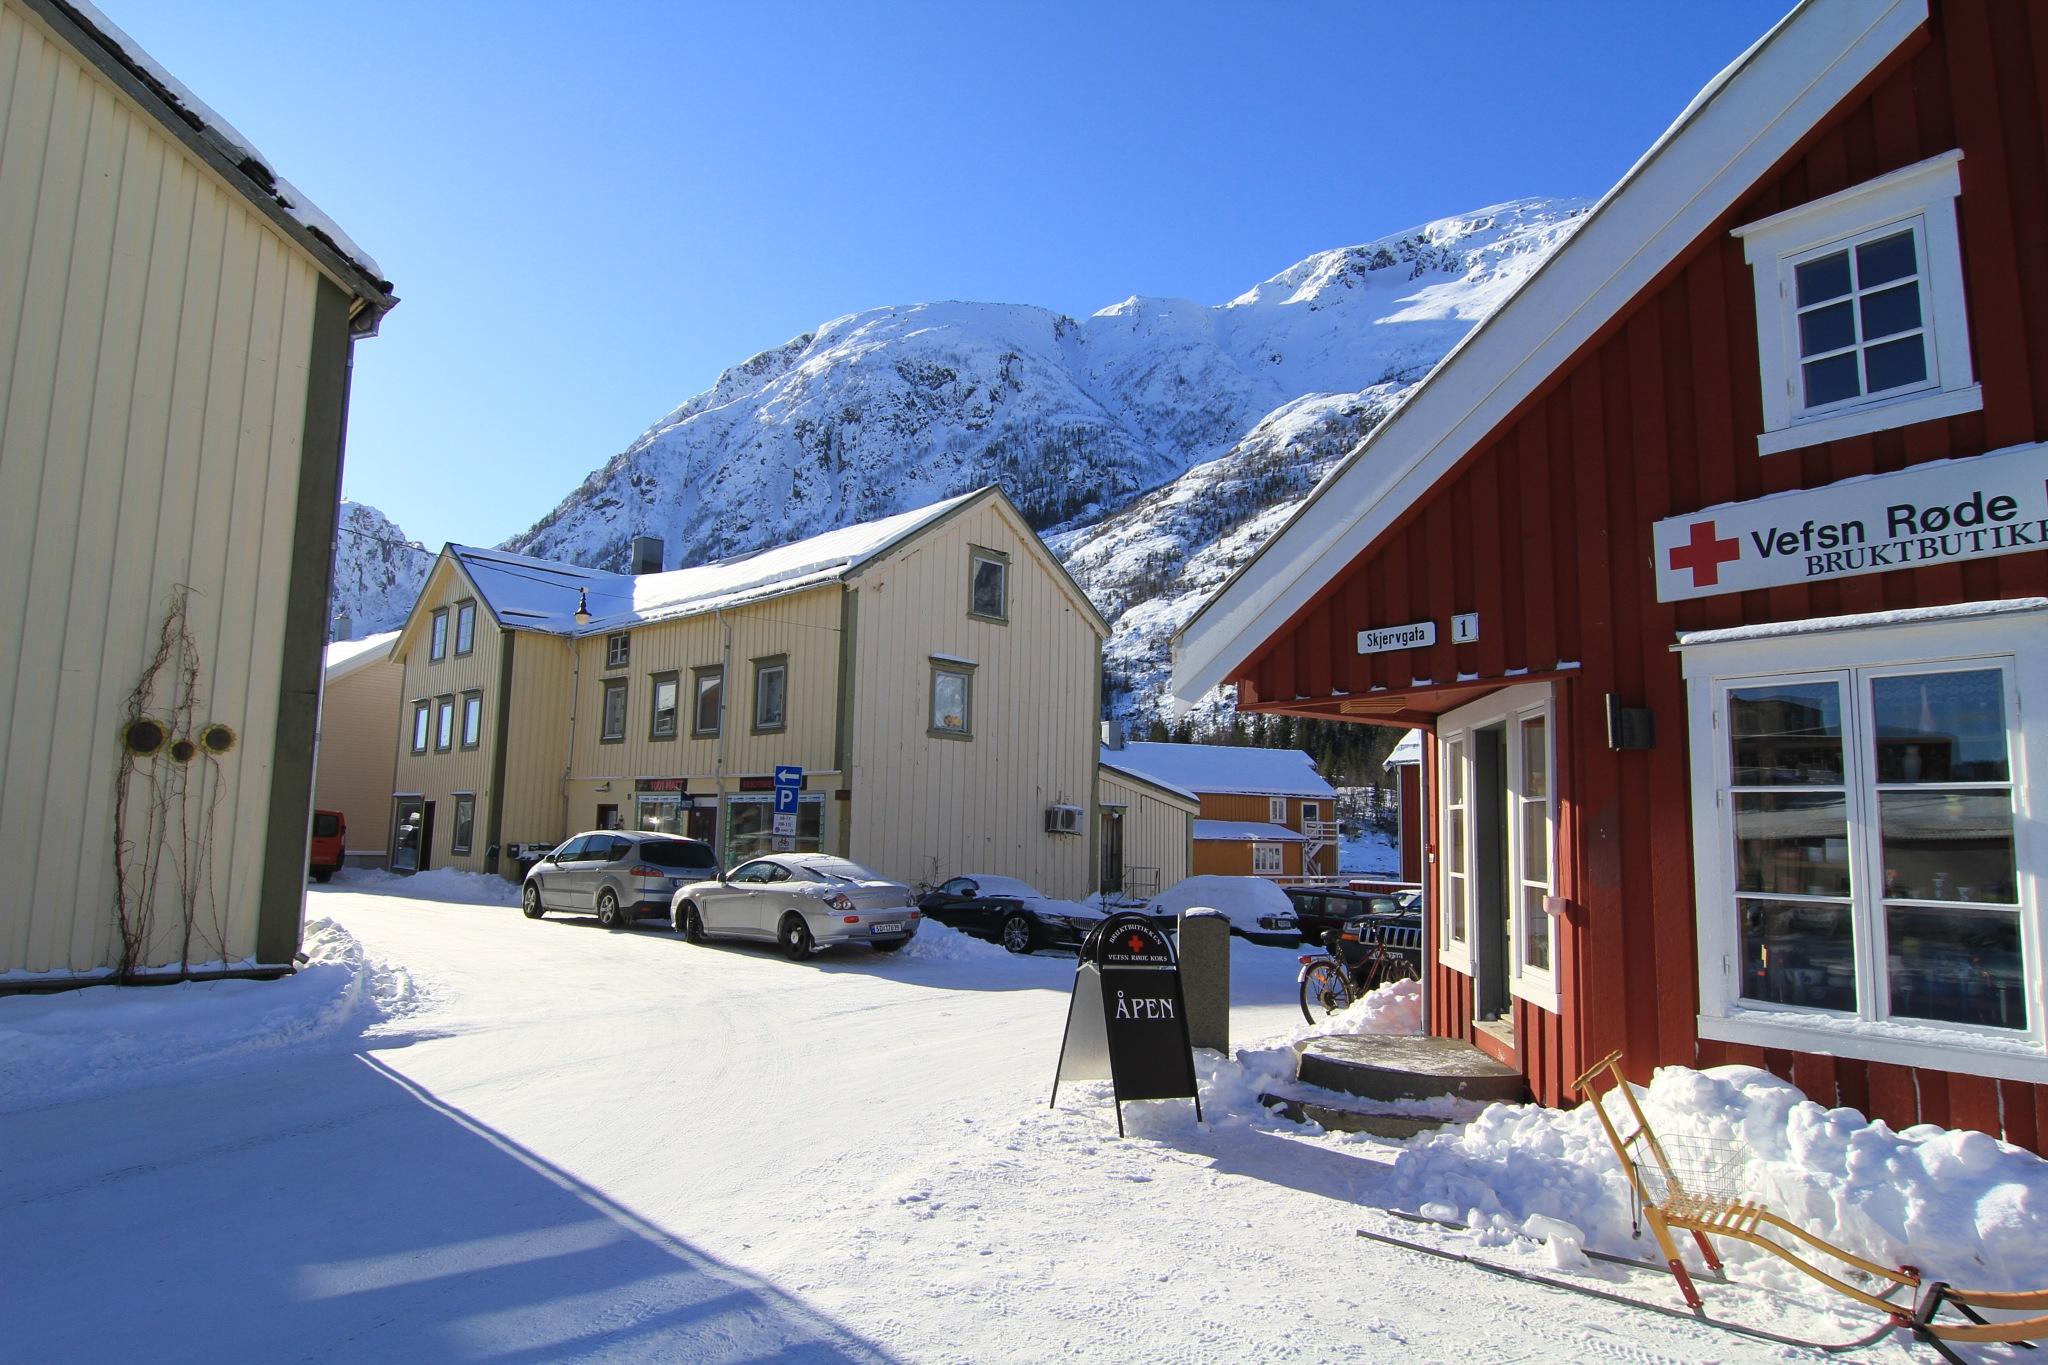 winter in town by vidar mathisen